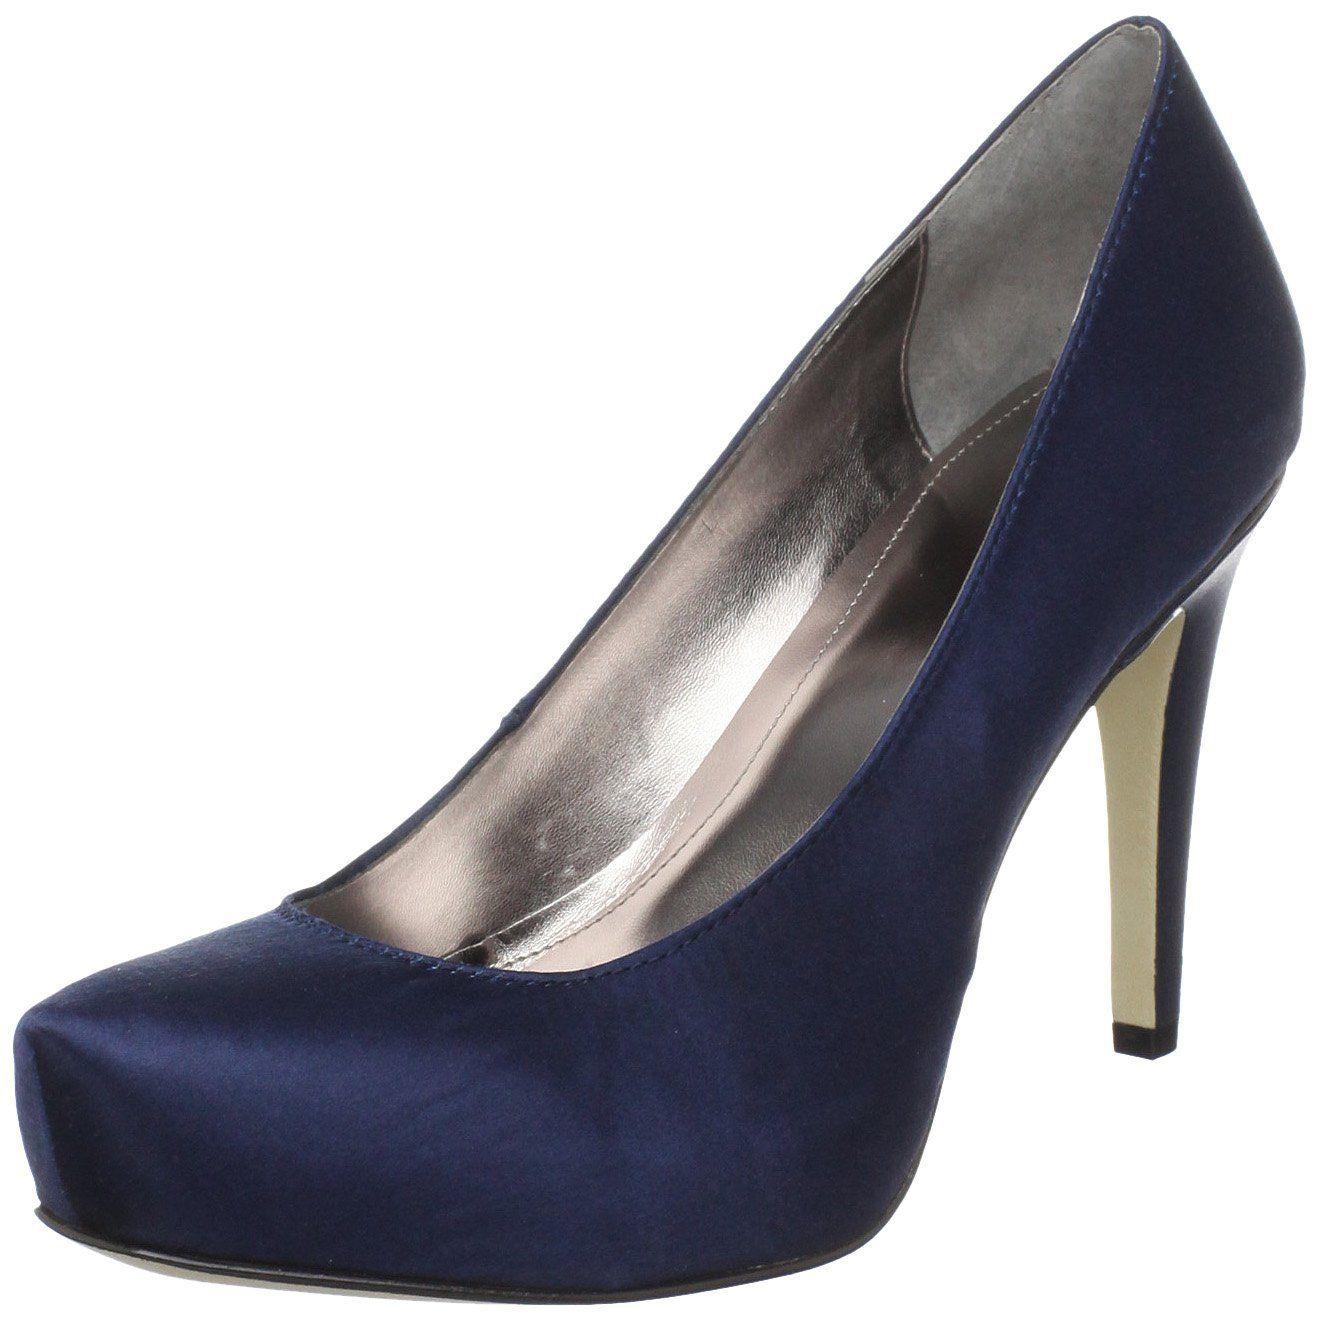 Pin by kara burton on wedding pinterest navy navy shoes and